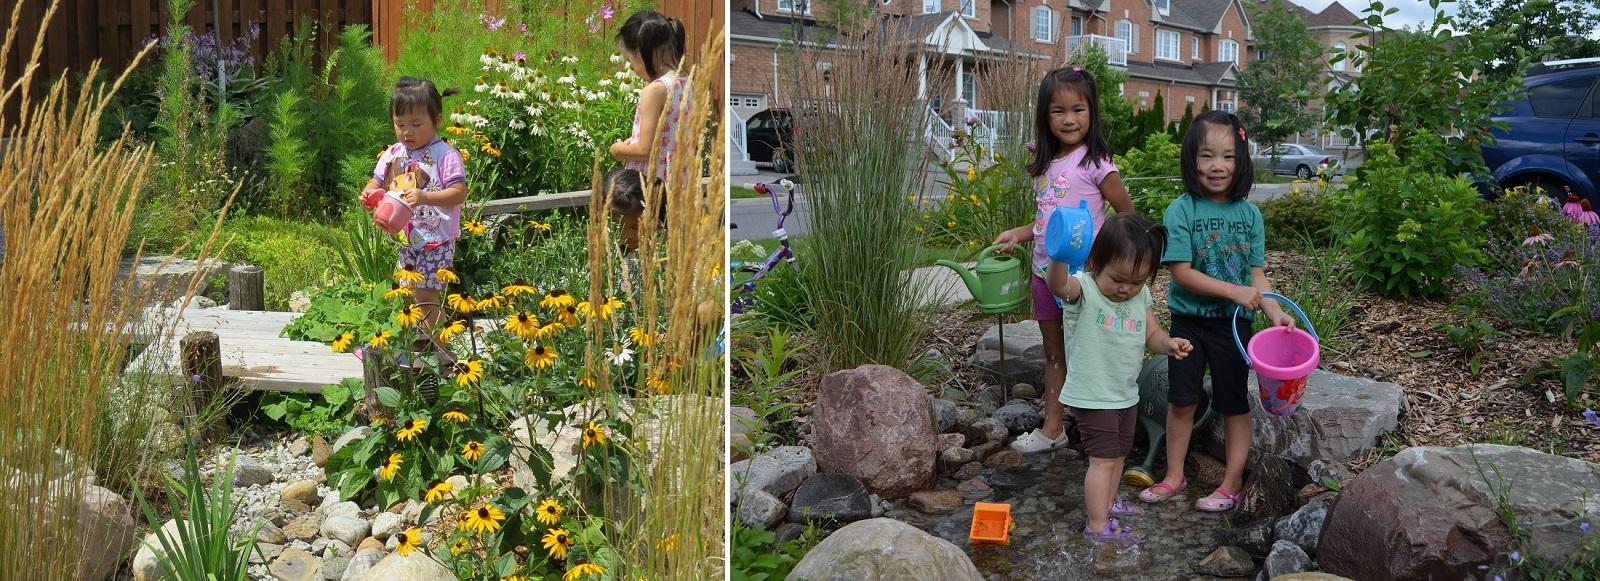 Children enjoy Front Yard Makeover at 95 Wheelwright Drive